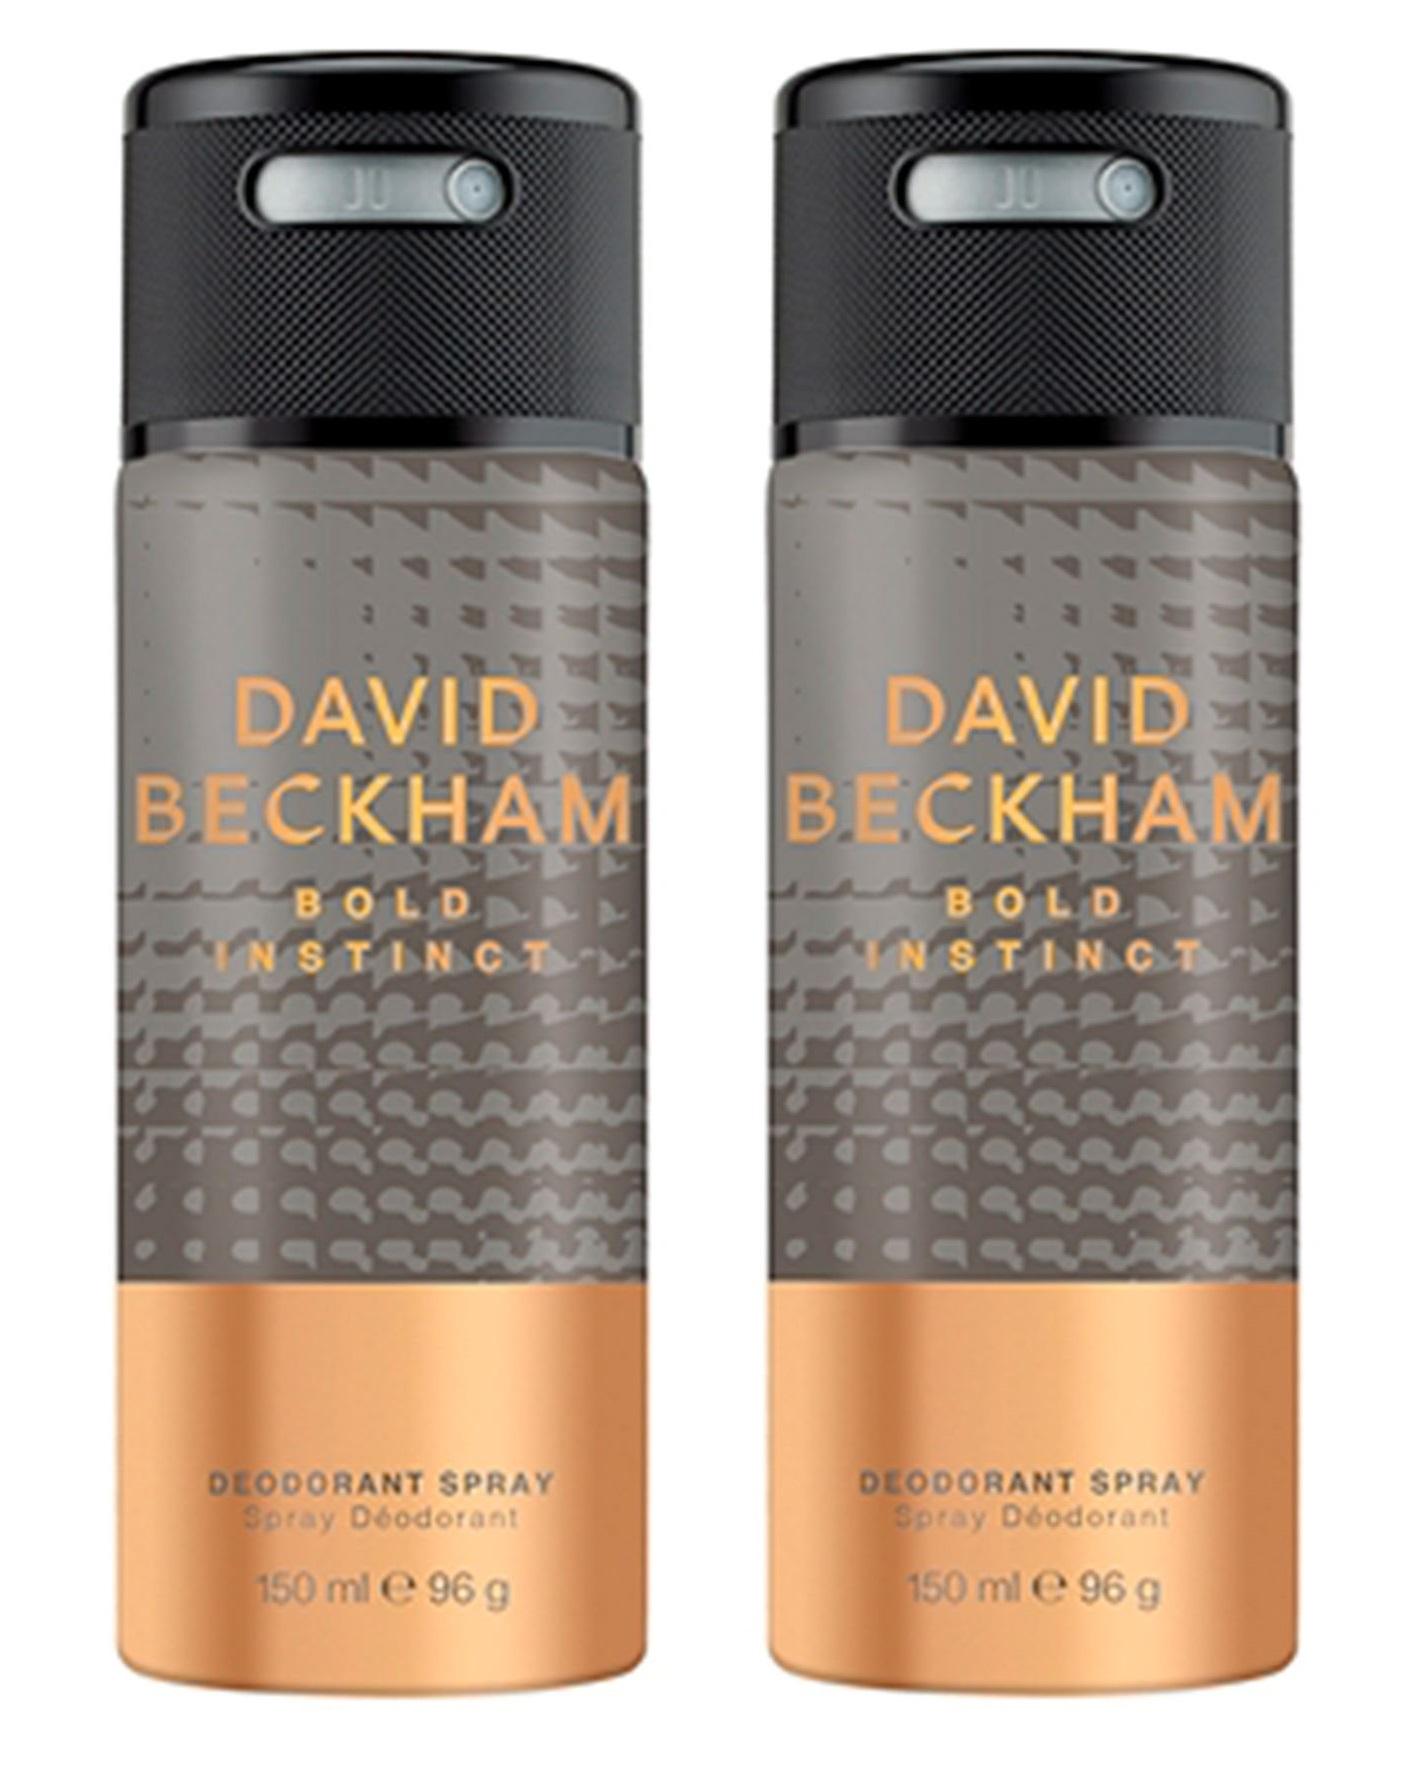 David Beckham - 2x Bold Instinct Deodorant Spray